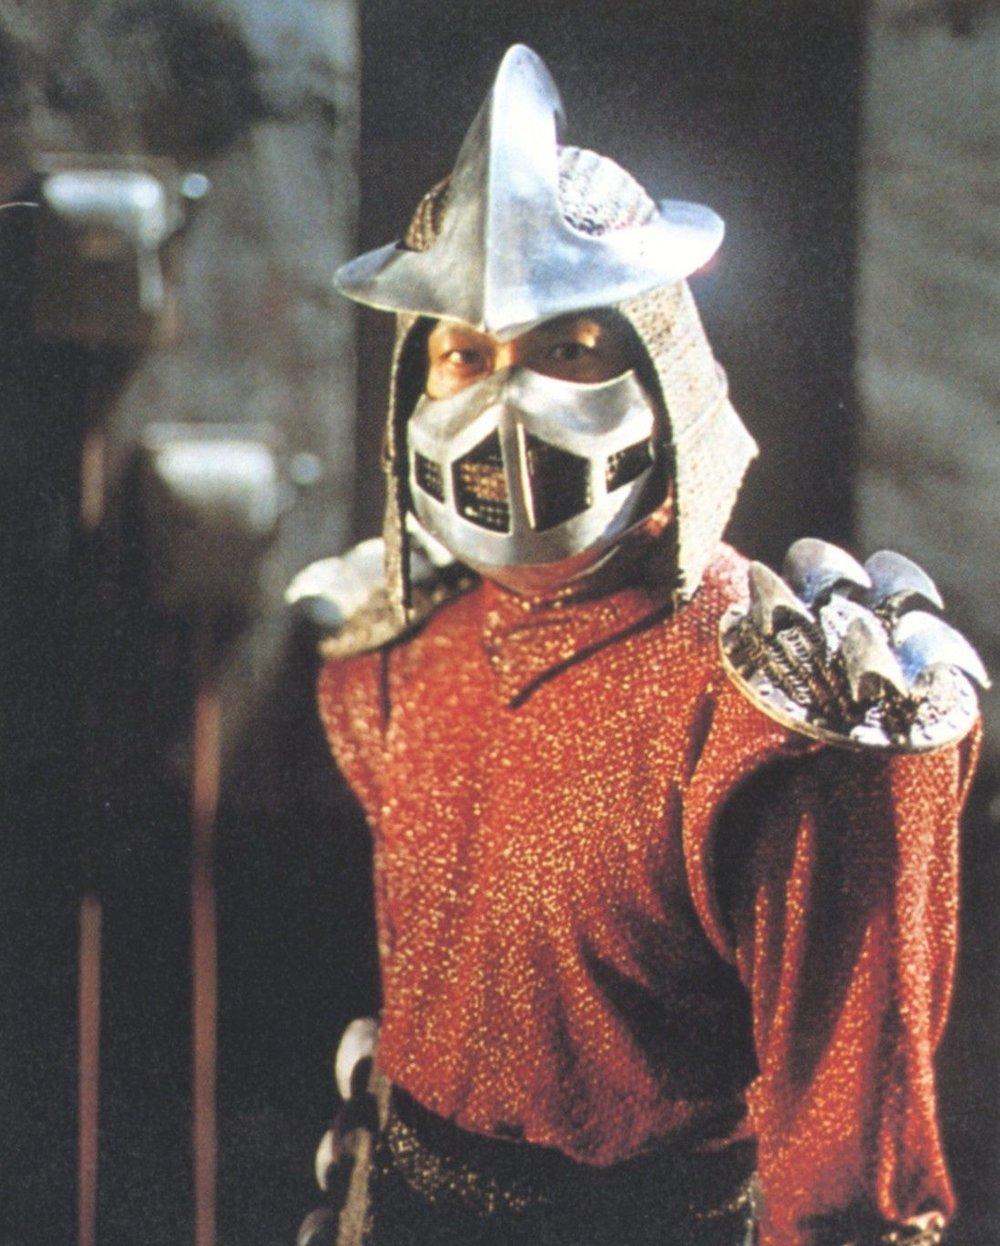 Teenage Mutant Ninja Turtles 2014 Movie Review TMNT Original 1990 Movie Shredder